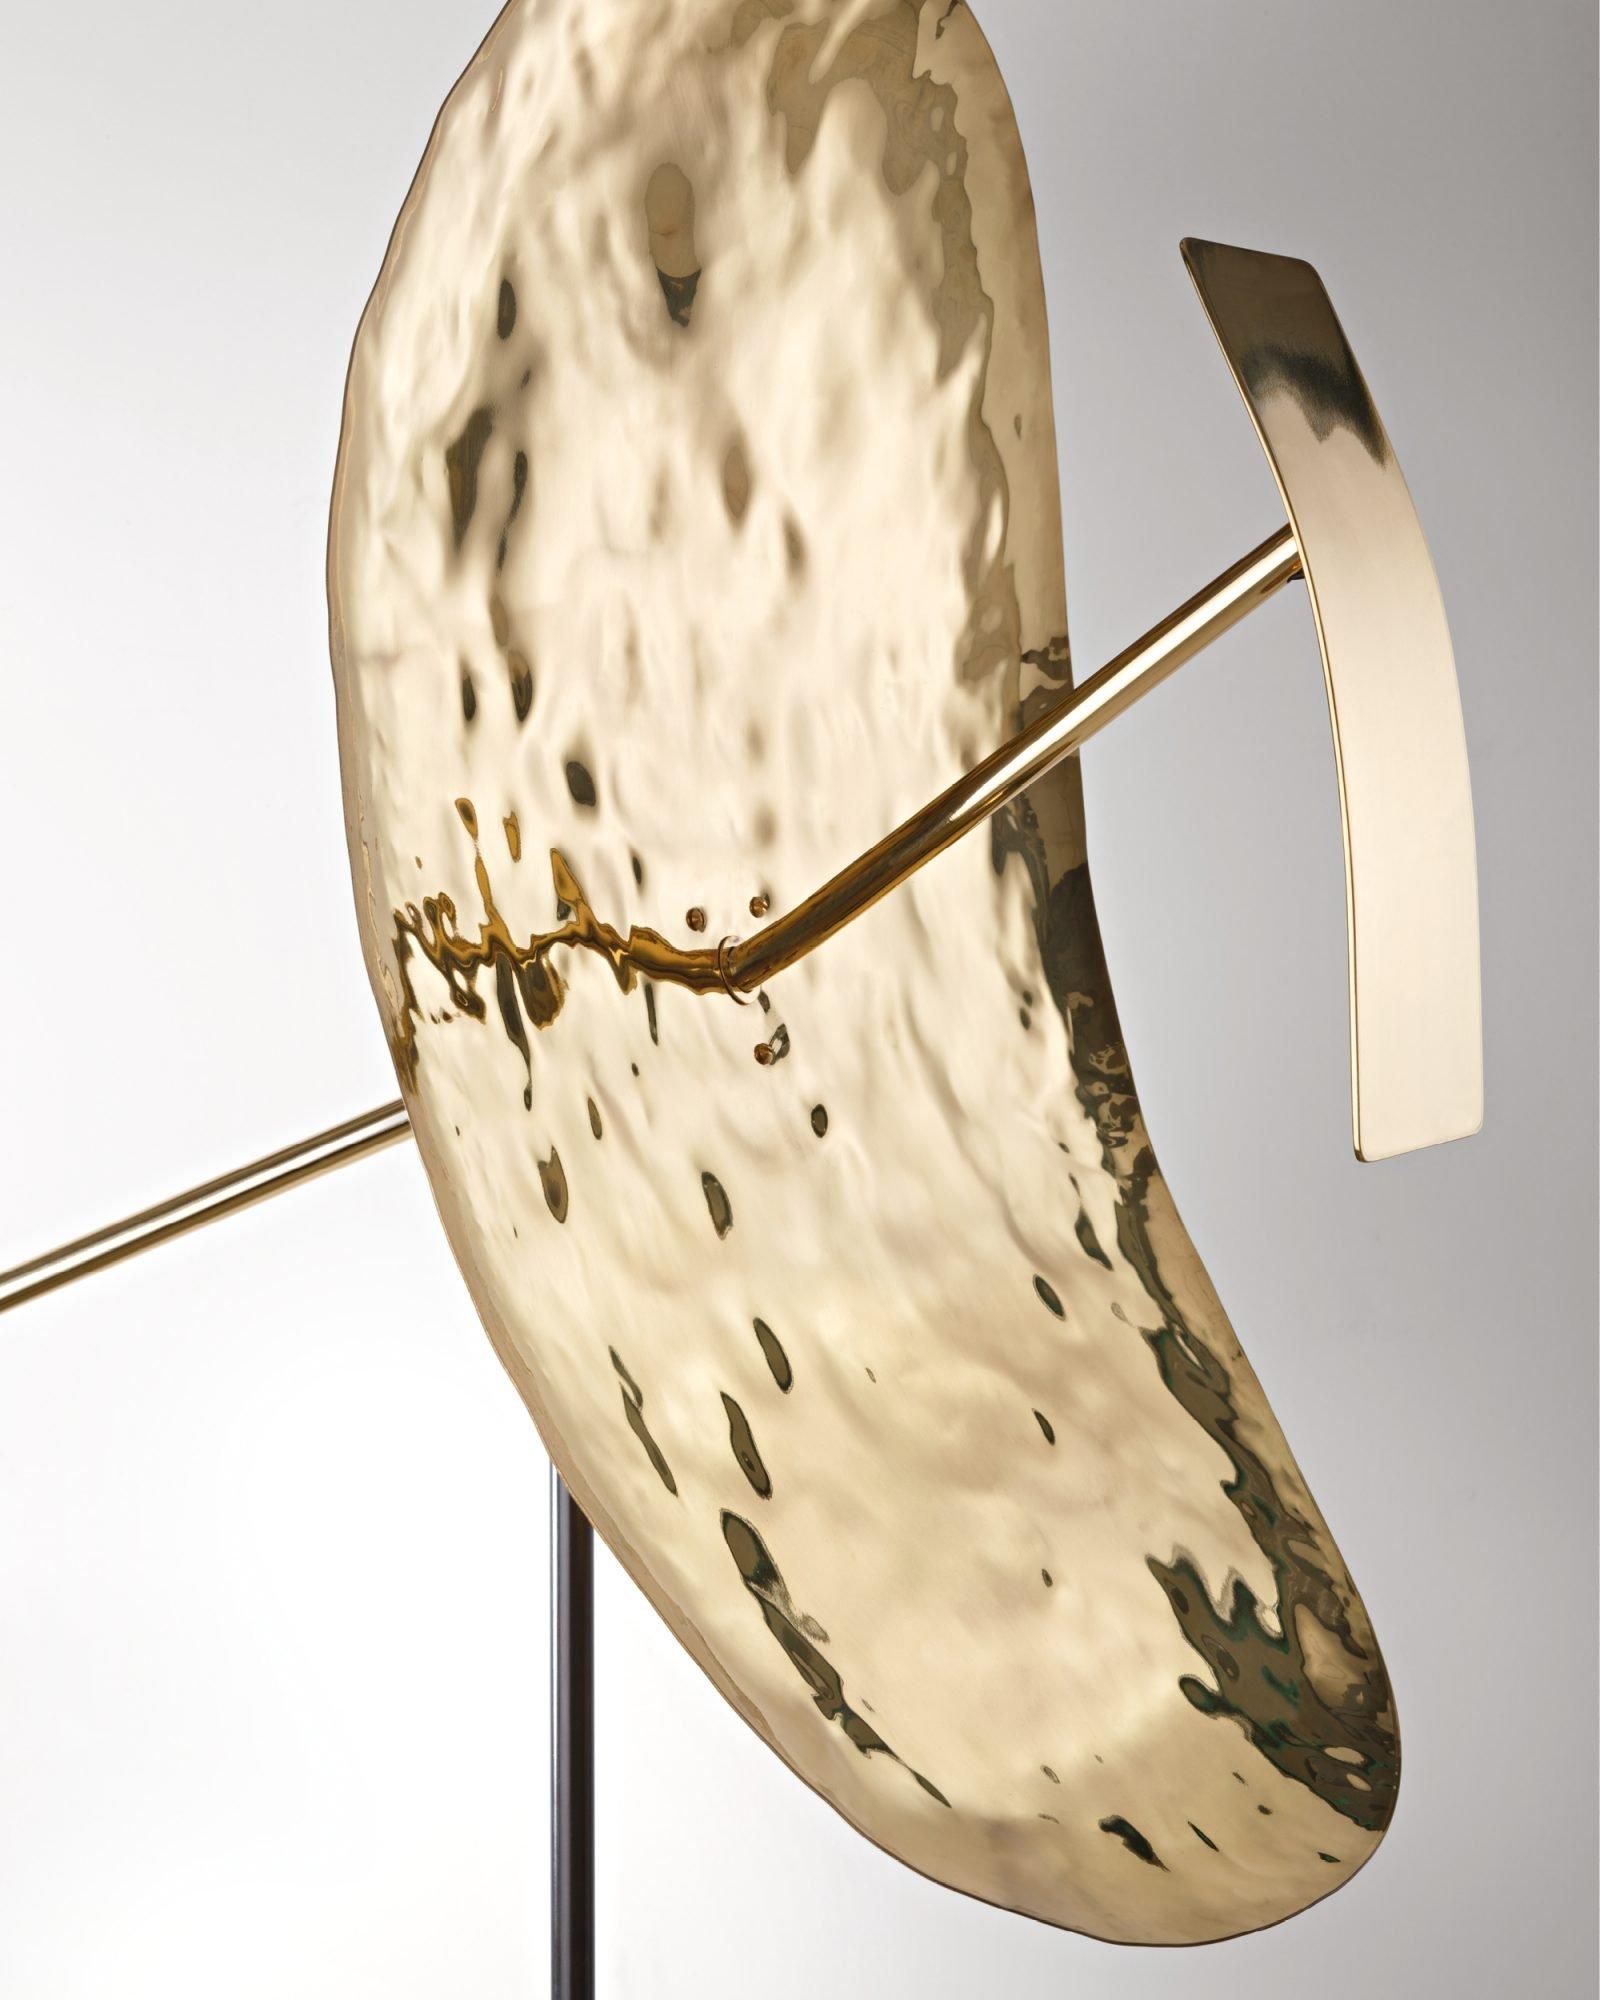 Ribot Lamp lighting from De Castelli, designed by Alessandro Mason